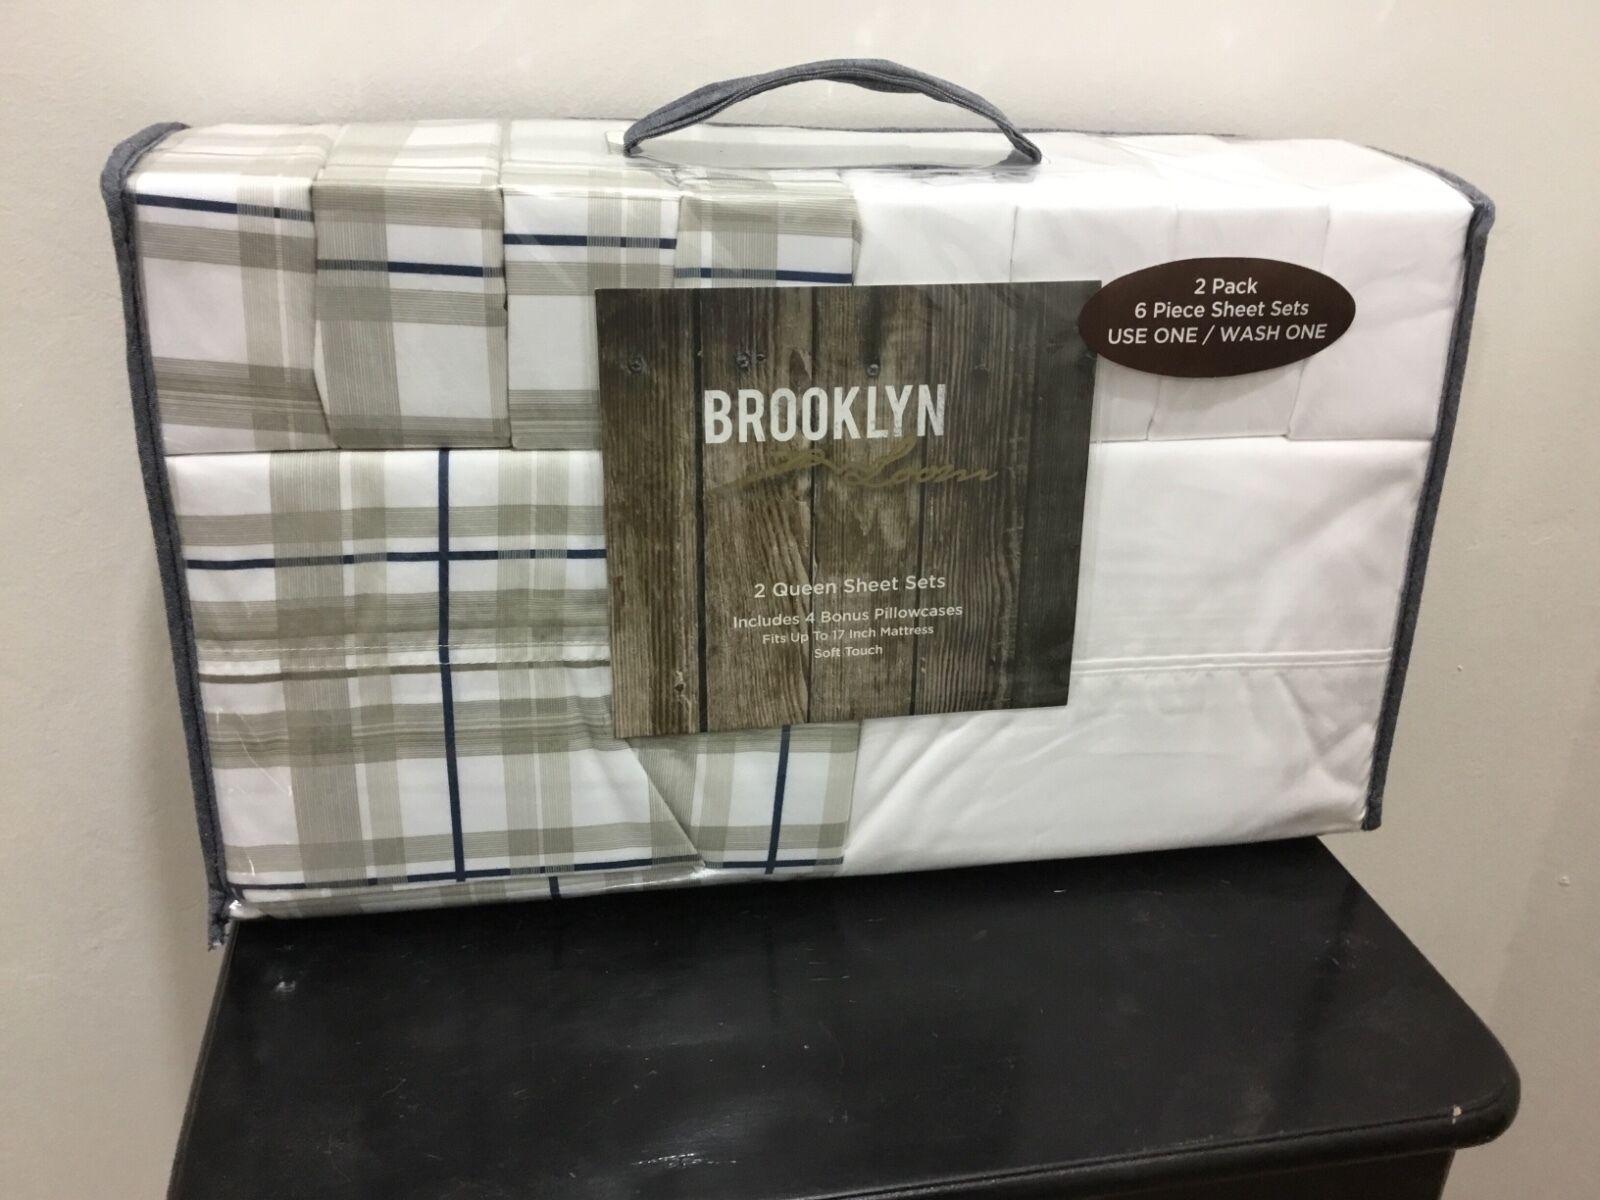 Set of 2 Queen sheet sets with 4 bonus pillow cases Brand ne